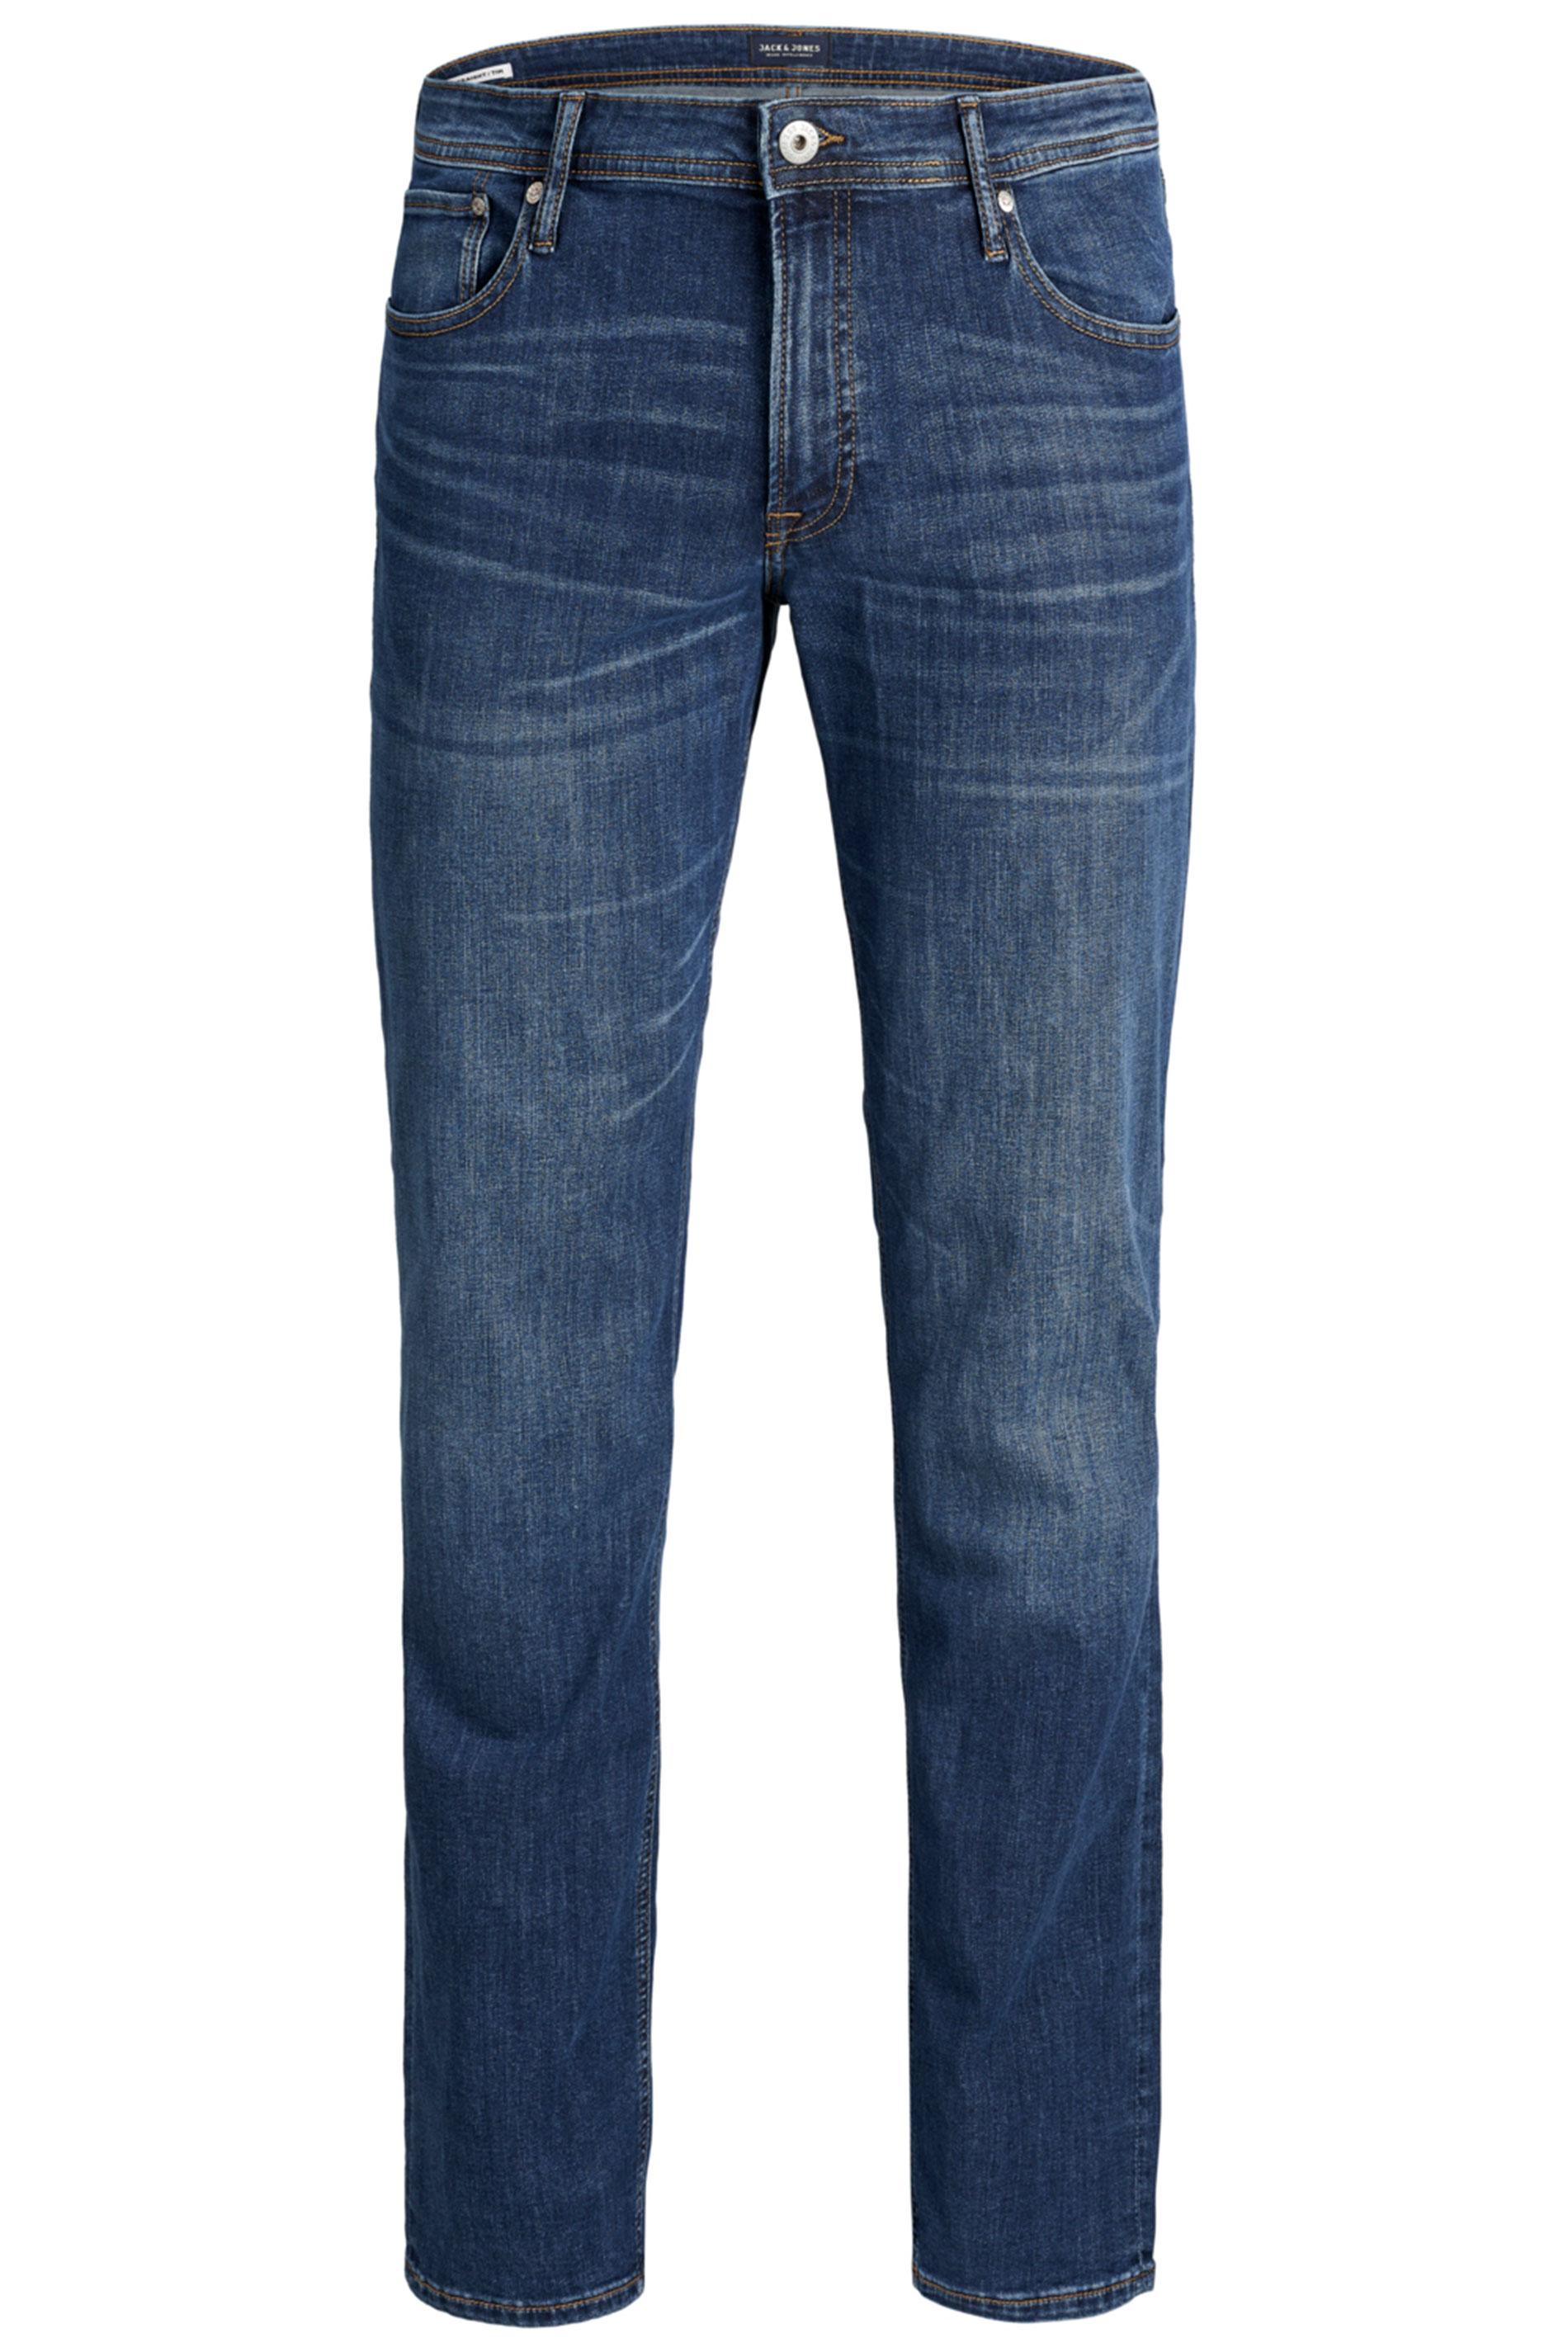 JACK & JONES Blue Tim Original Slim Fit Jeans